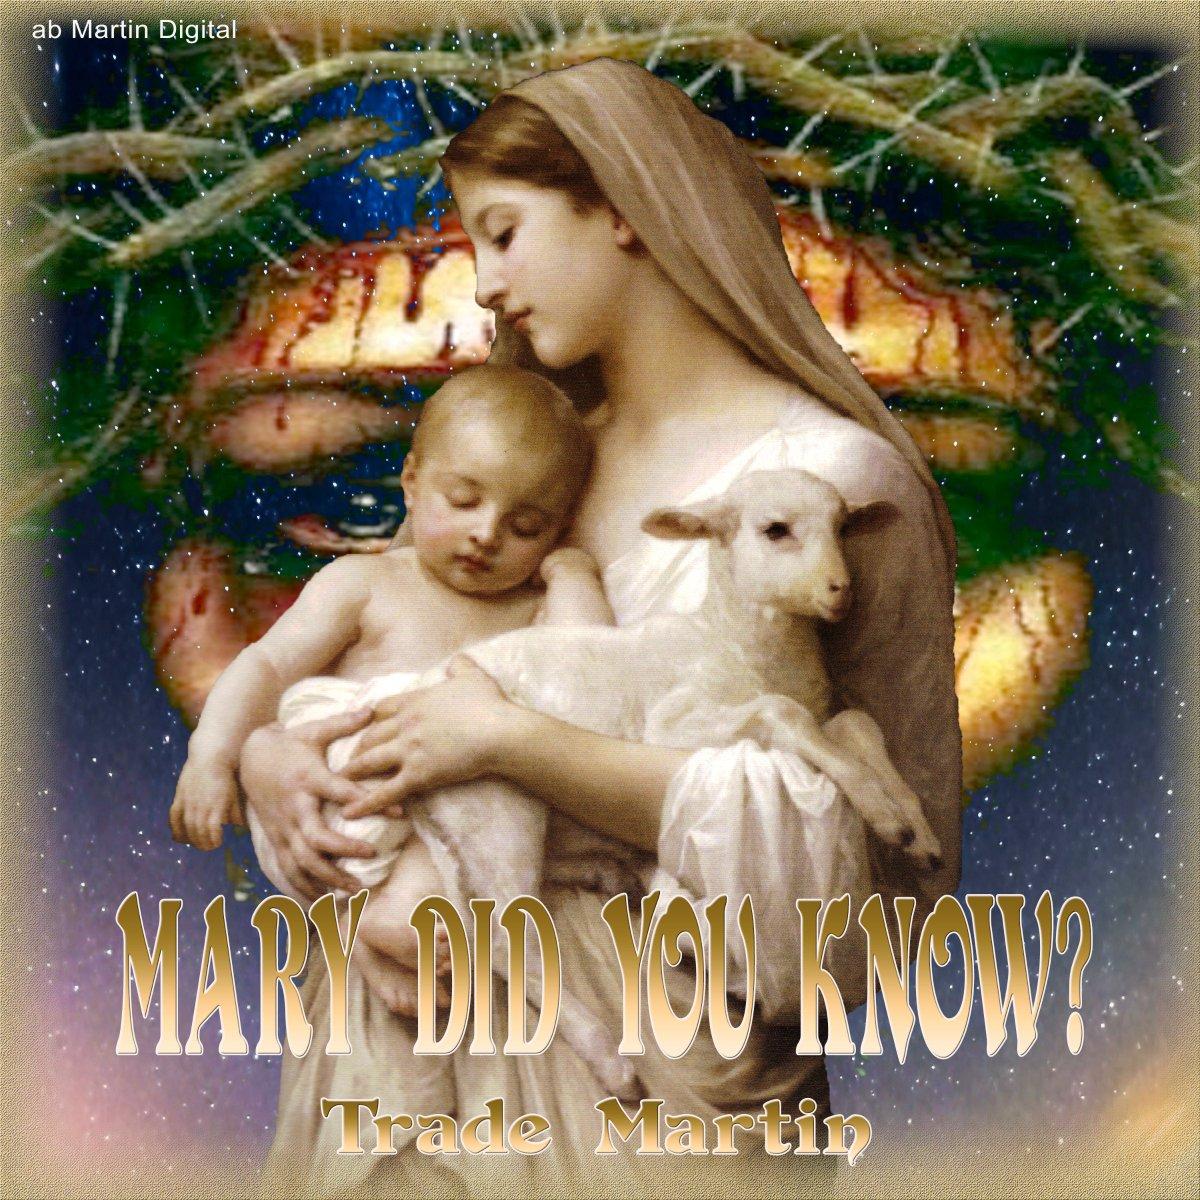 .Mary Did You Know https://www.youtube.com/watch?v=j9DF0cxQkek… #TradeMartin #abMartindigital #Amazon #iTunes #Pandora #Spotify #AppleMusic #OnSpotifyNow